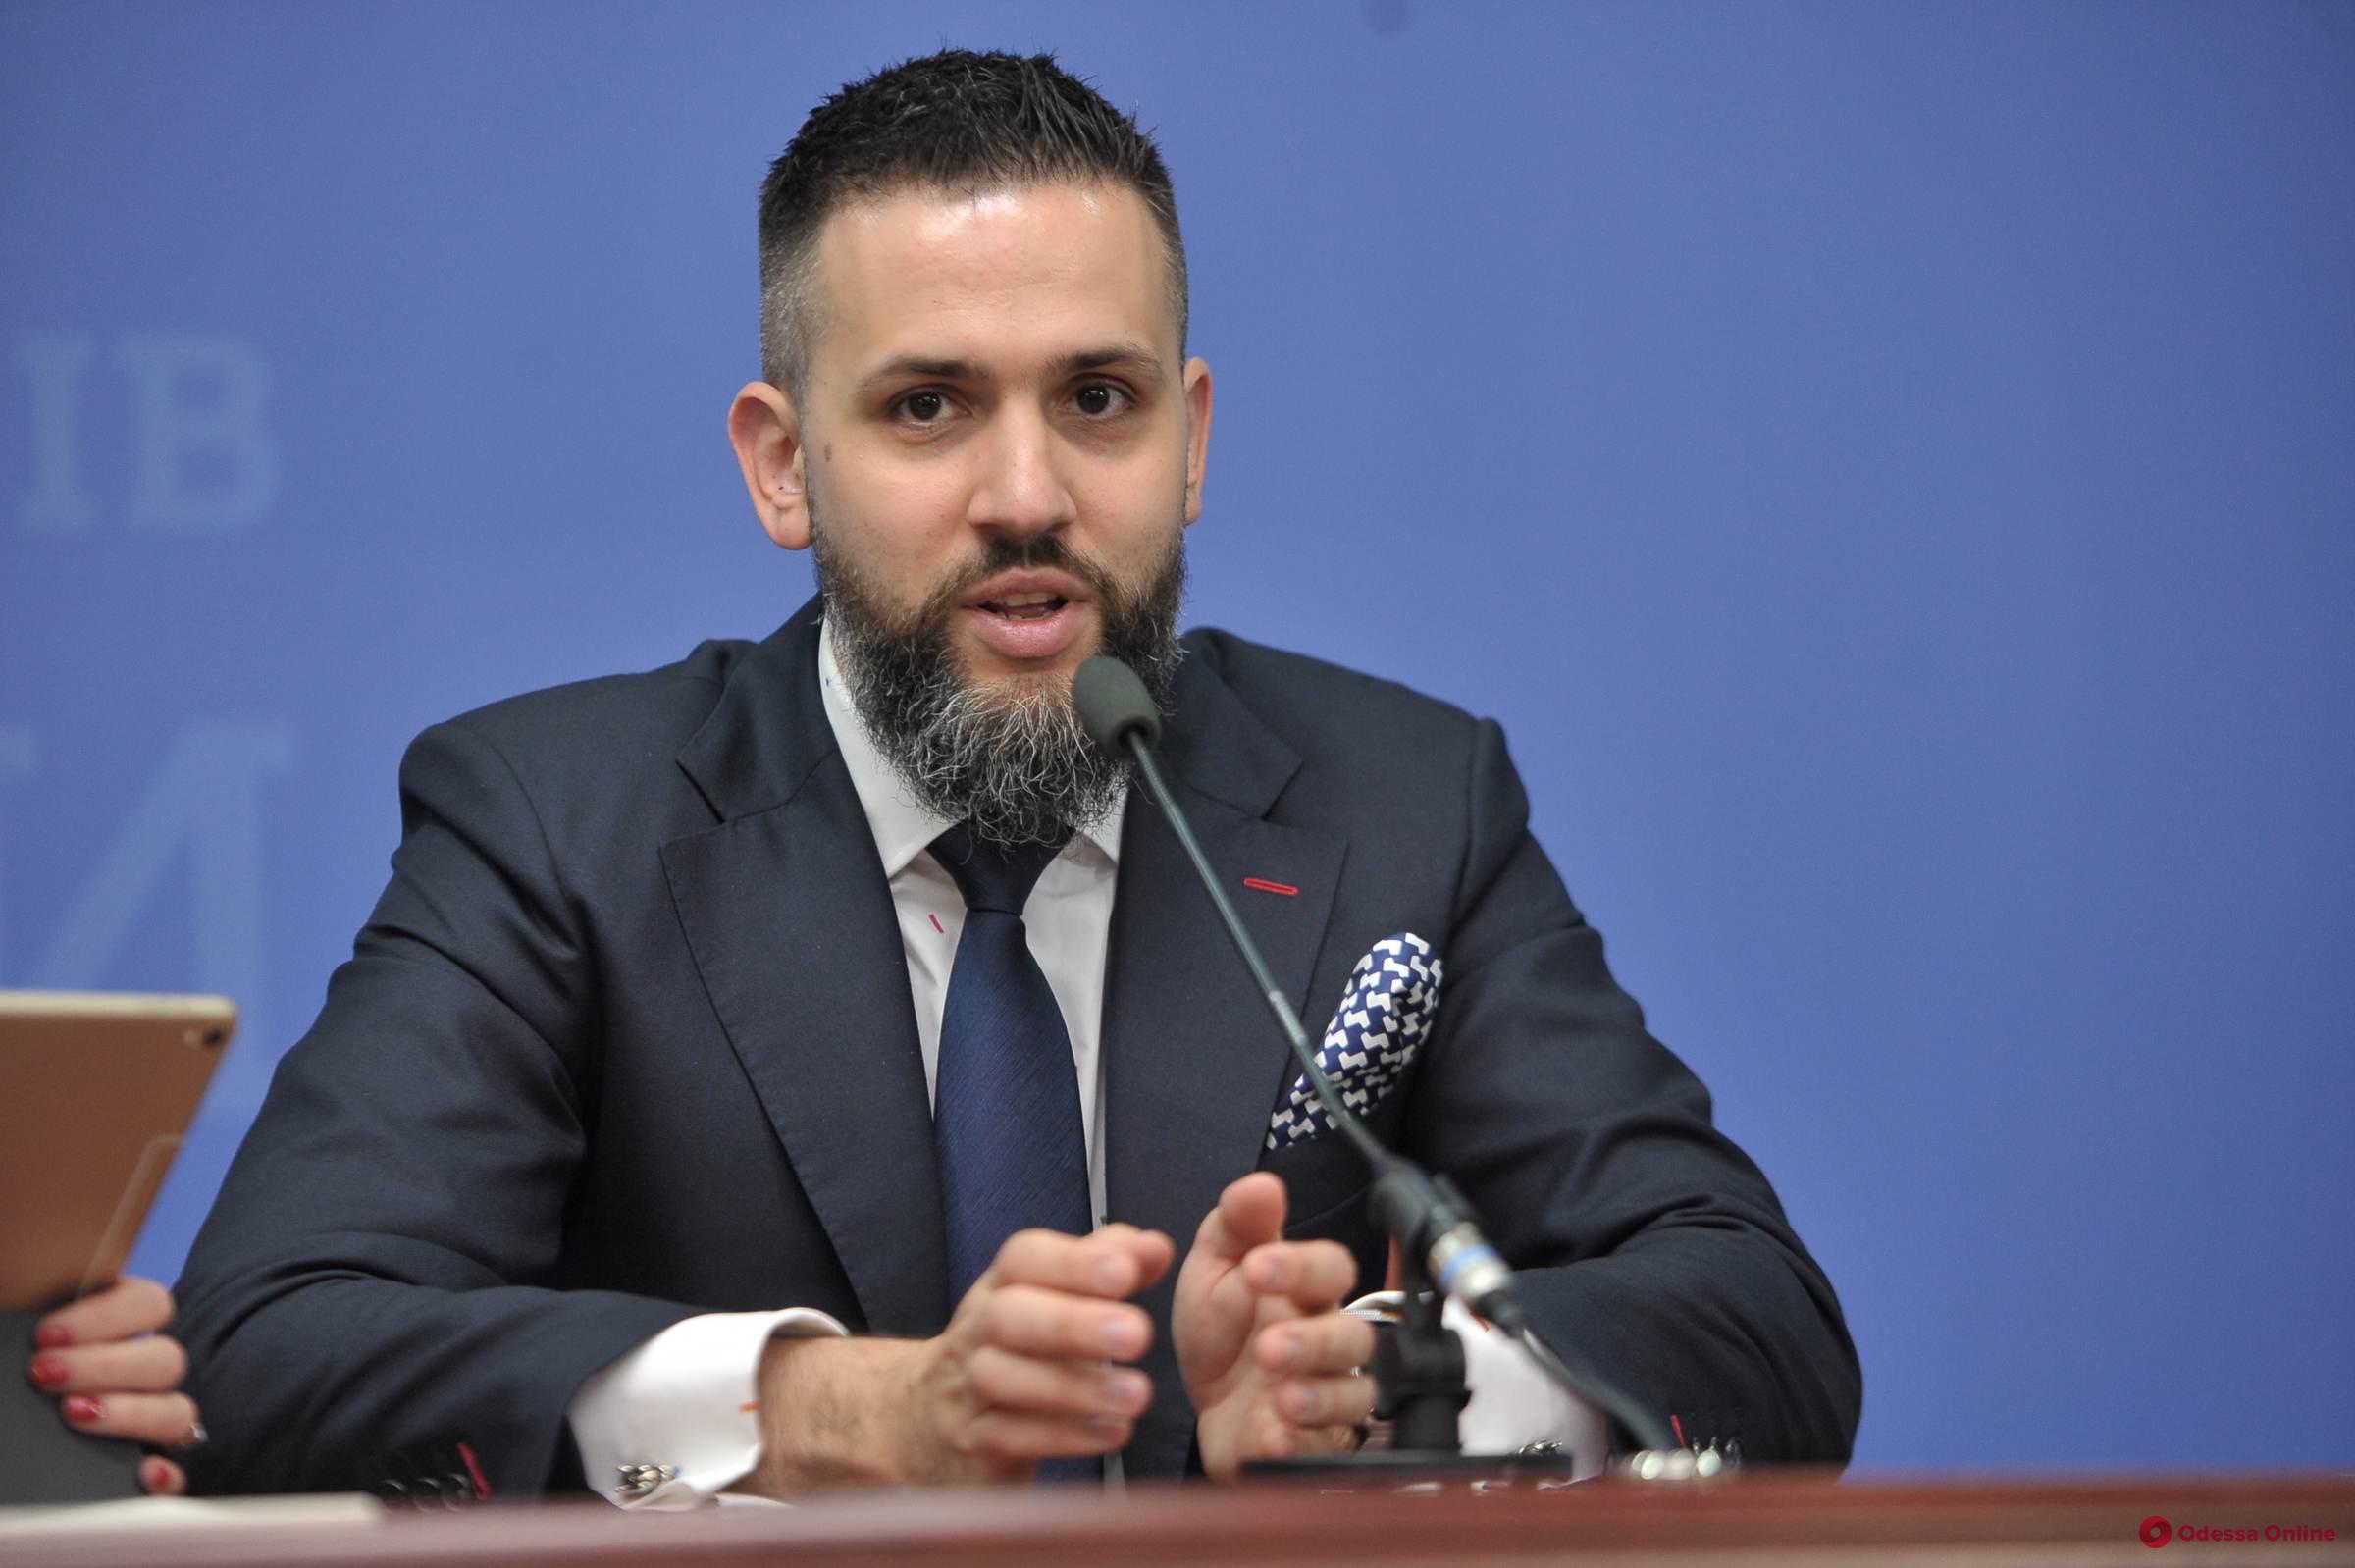 Уволенный экс-глава таможни Нефедов подал в суд на Кабмин